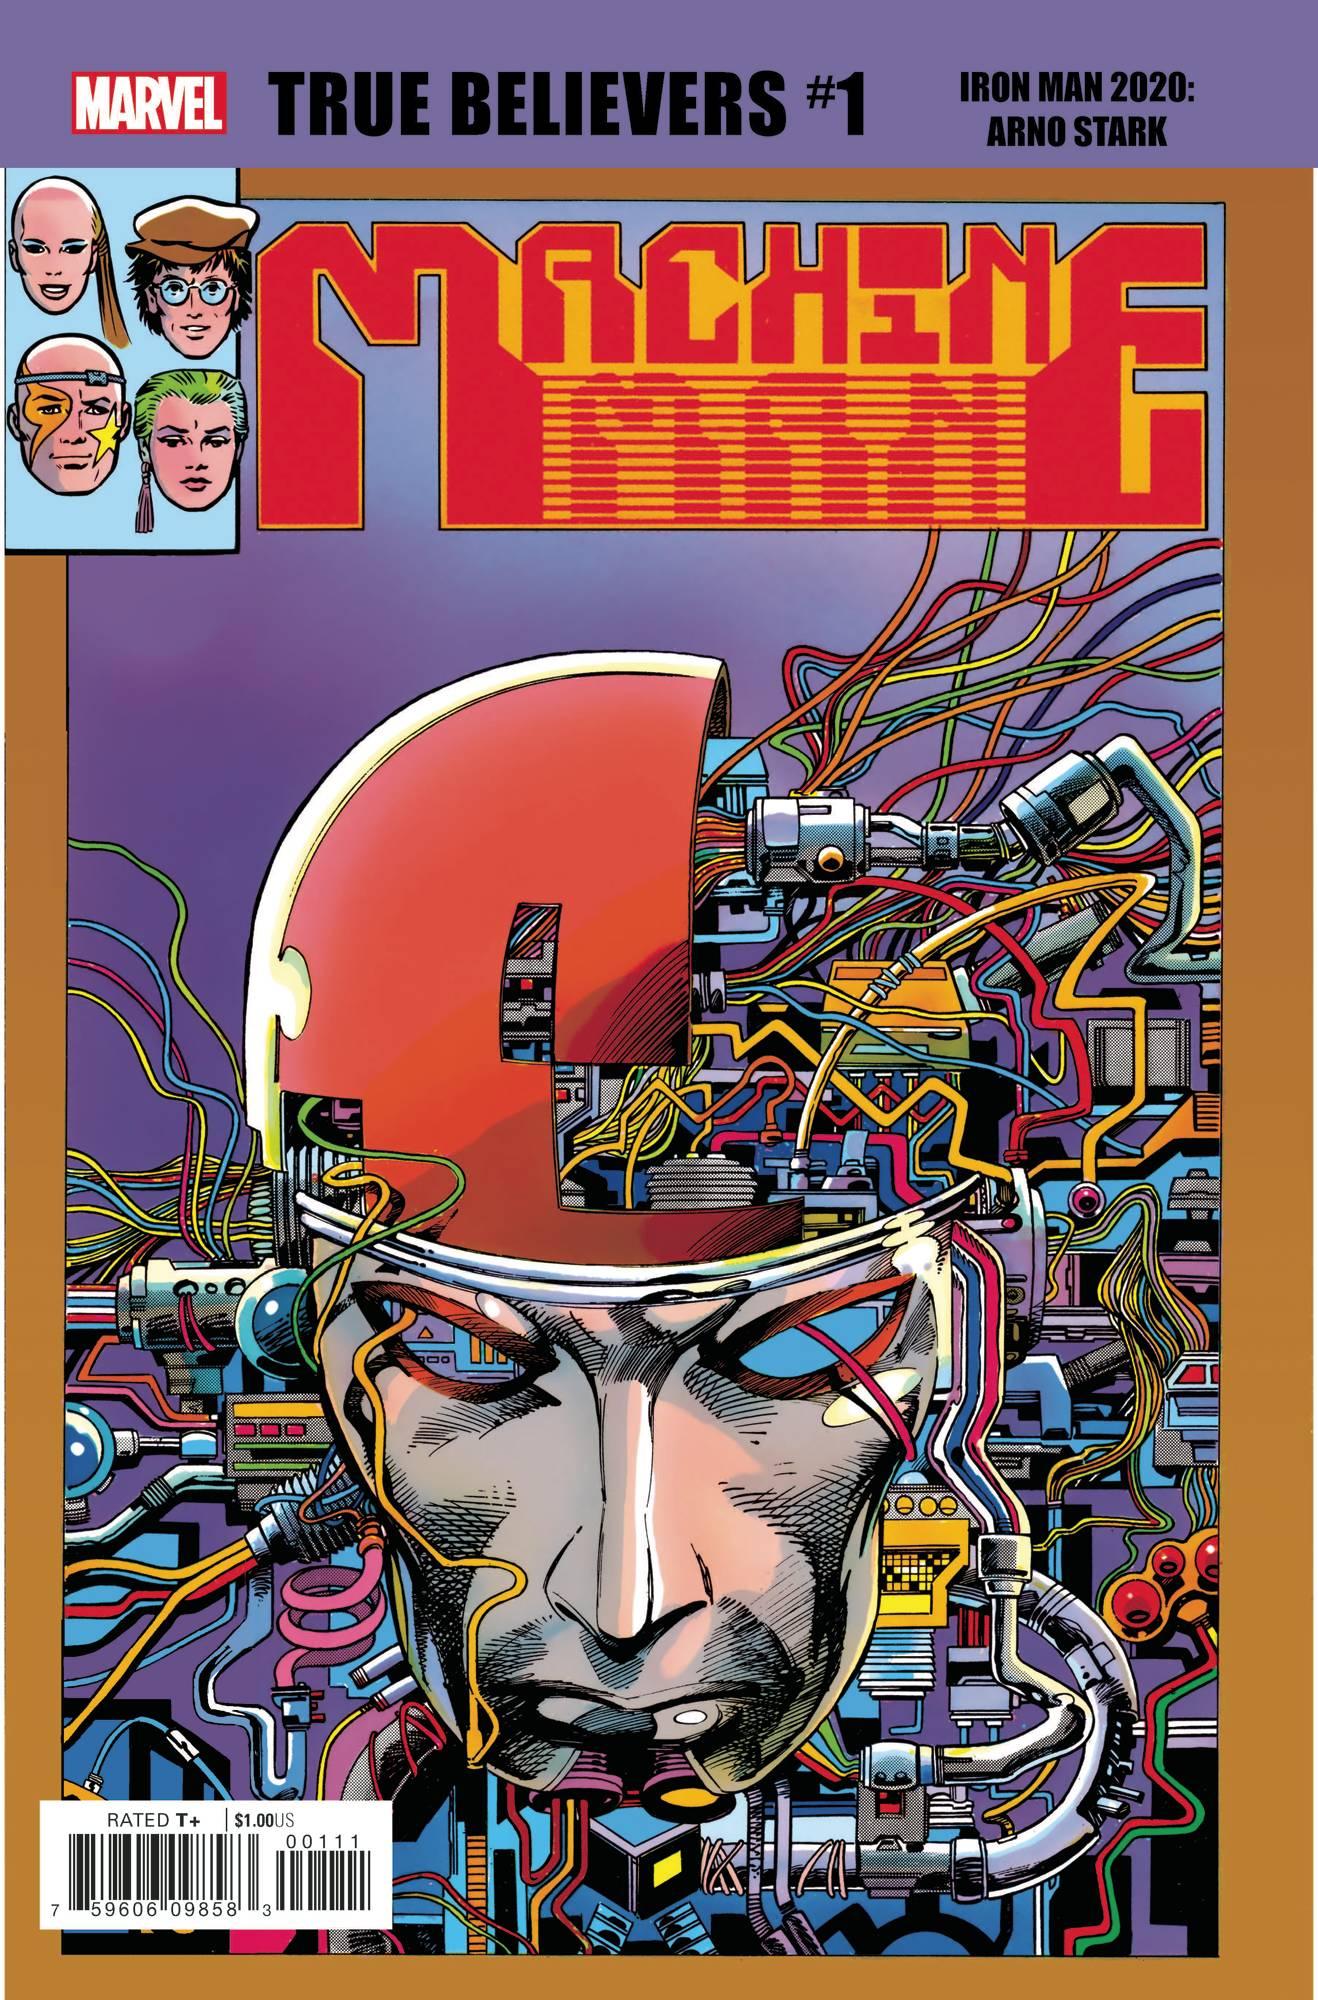 True Believers: Iron Man 2020 - Arno Stark #1 (2020)